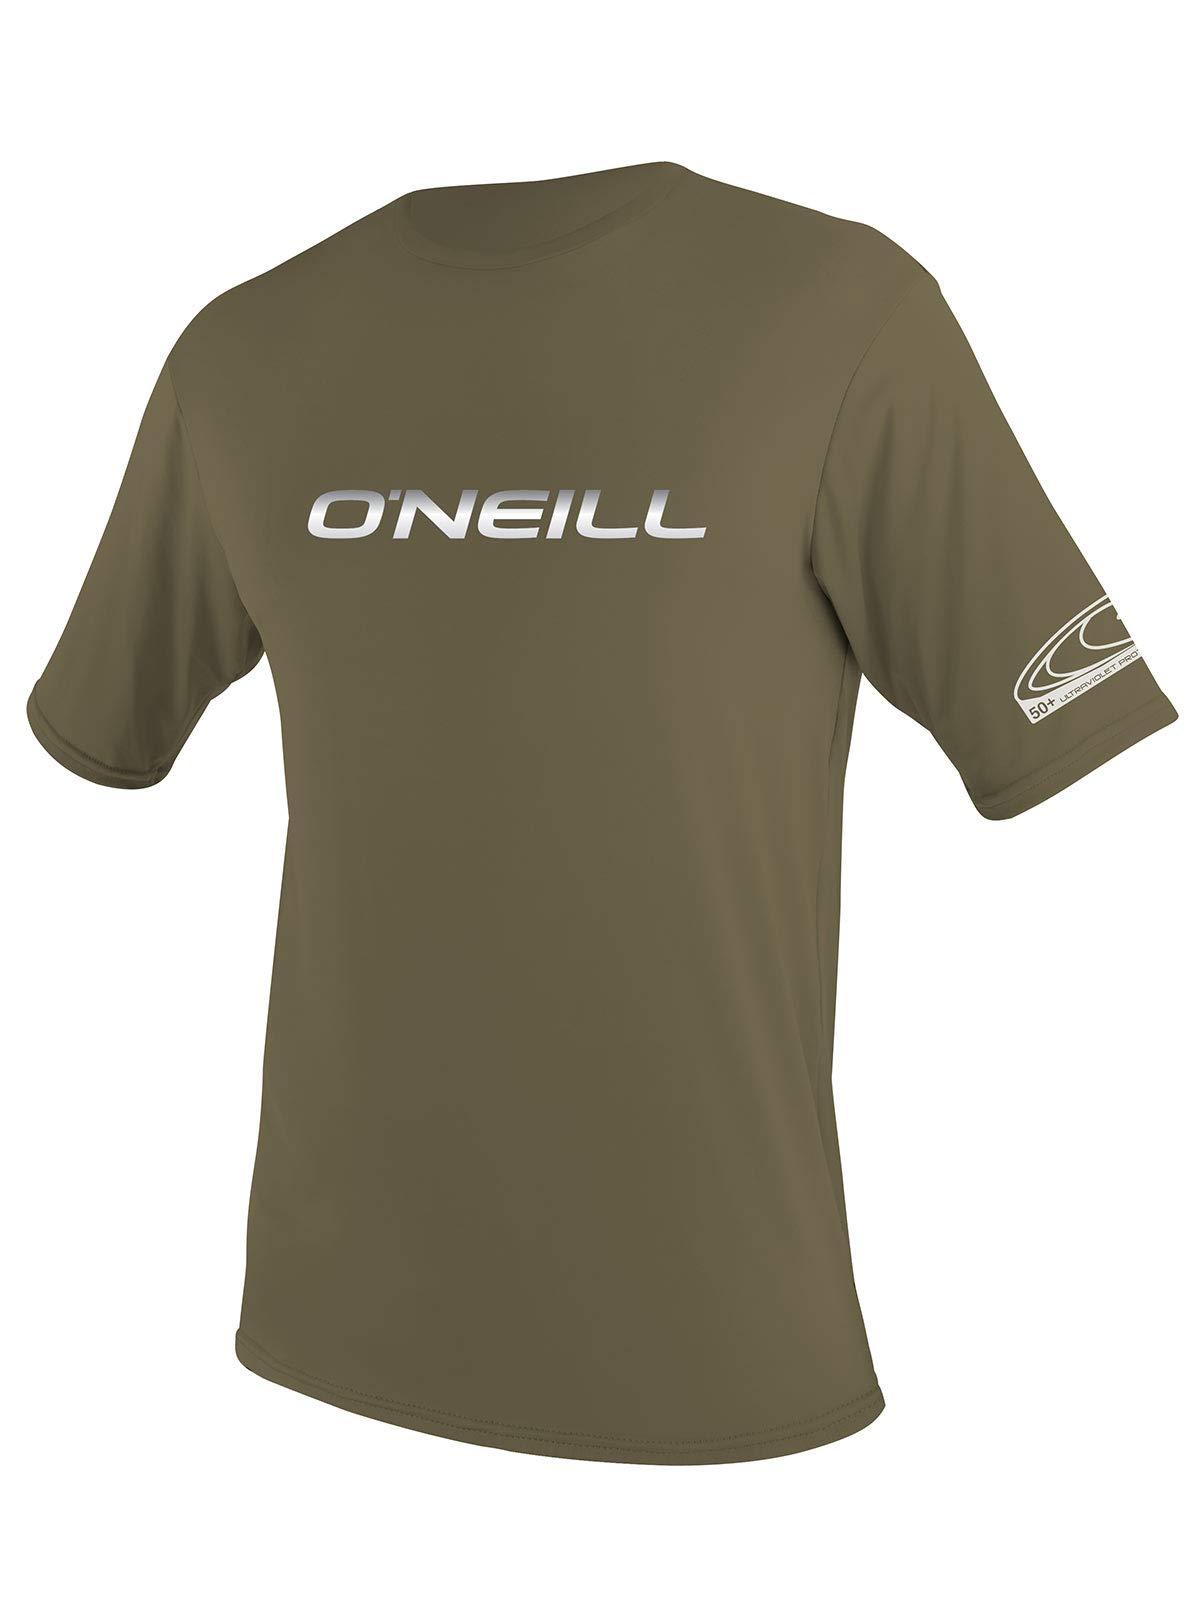 O'Neill Men's Basic Skins Slim Fit Rash Tee S Khaki (3402IB)